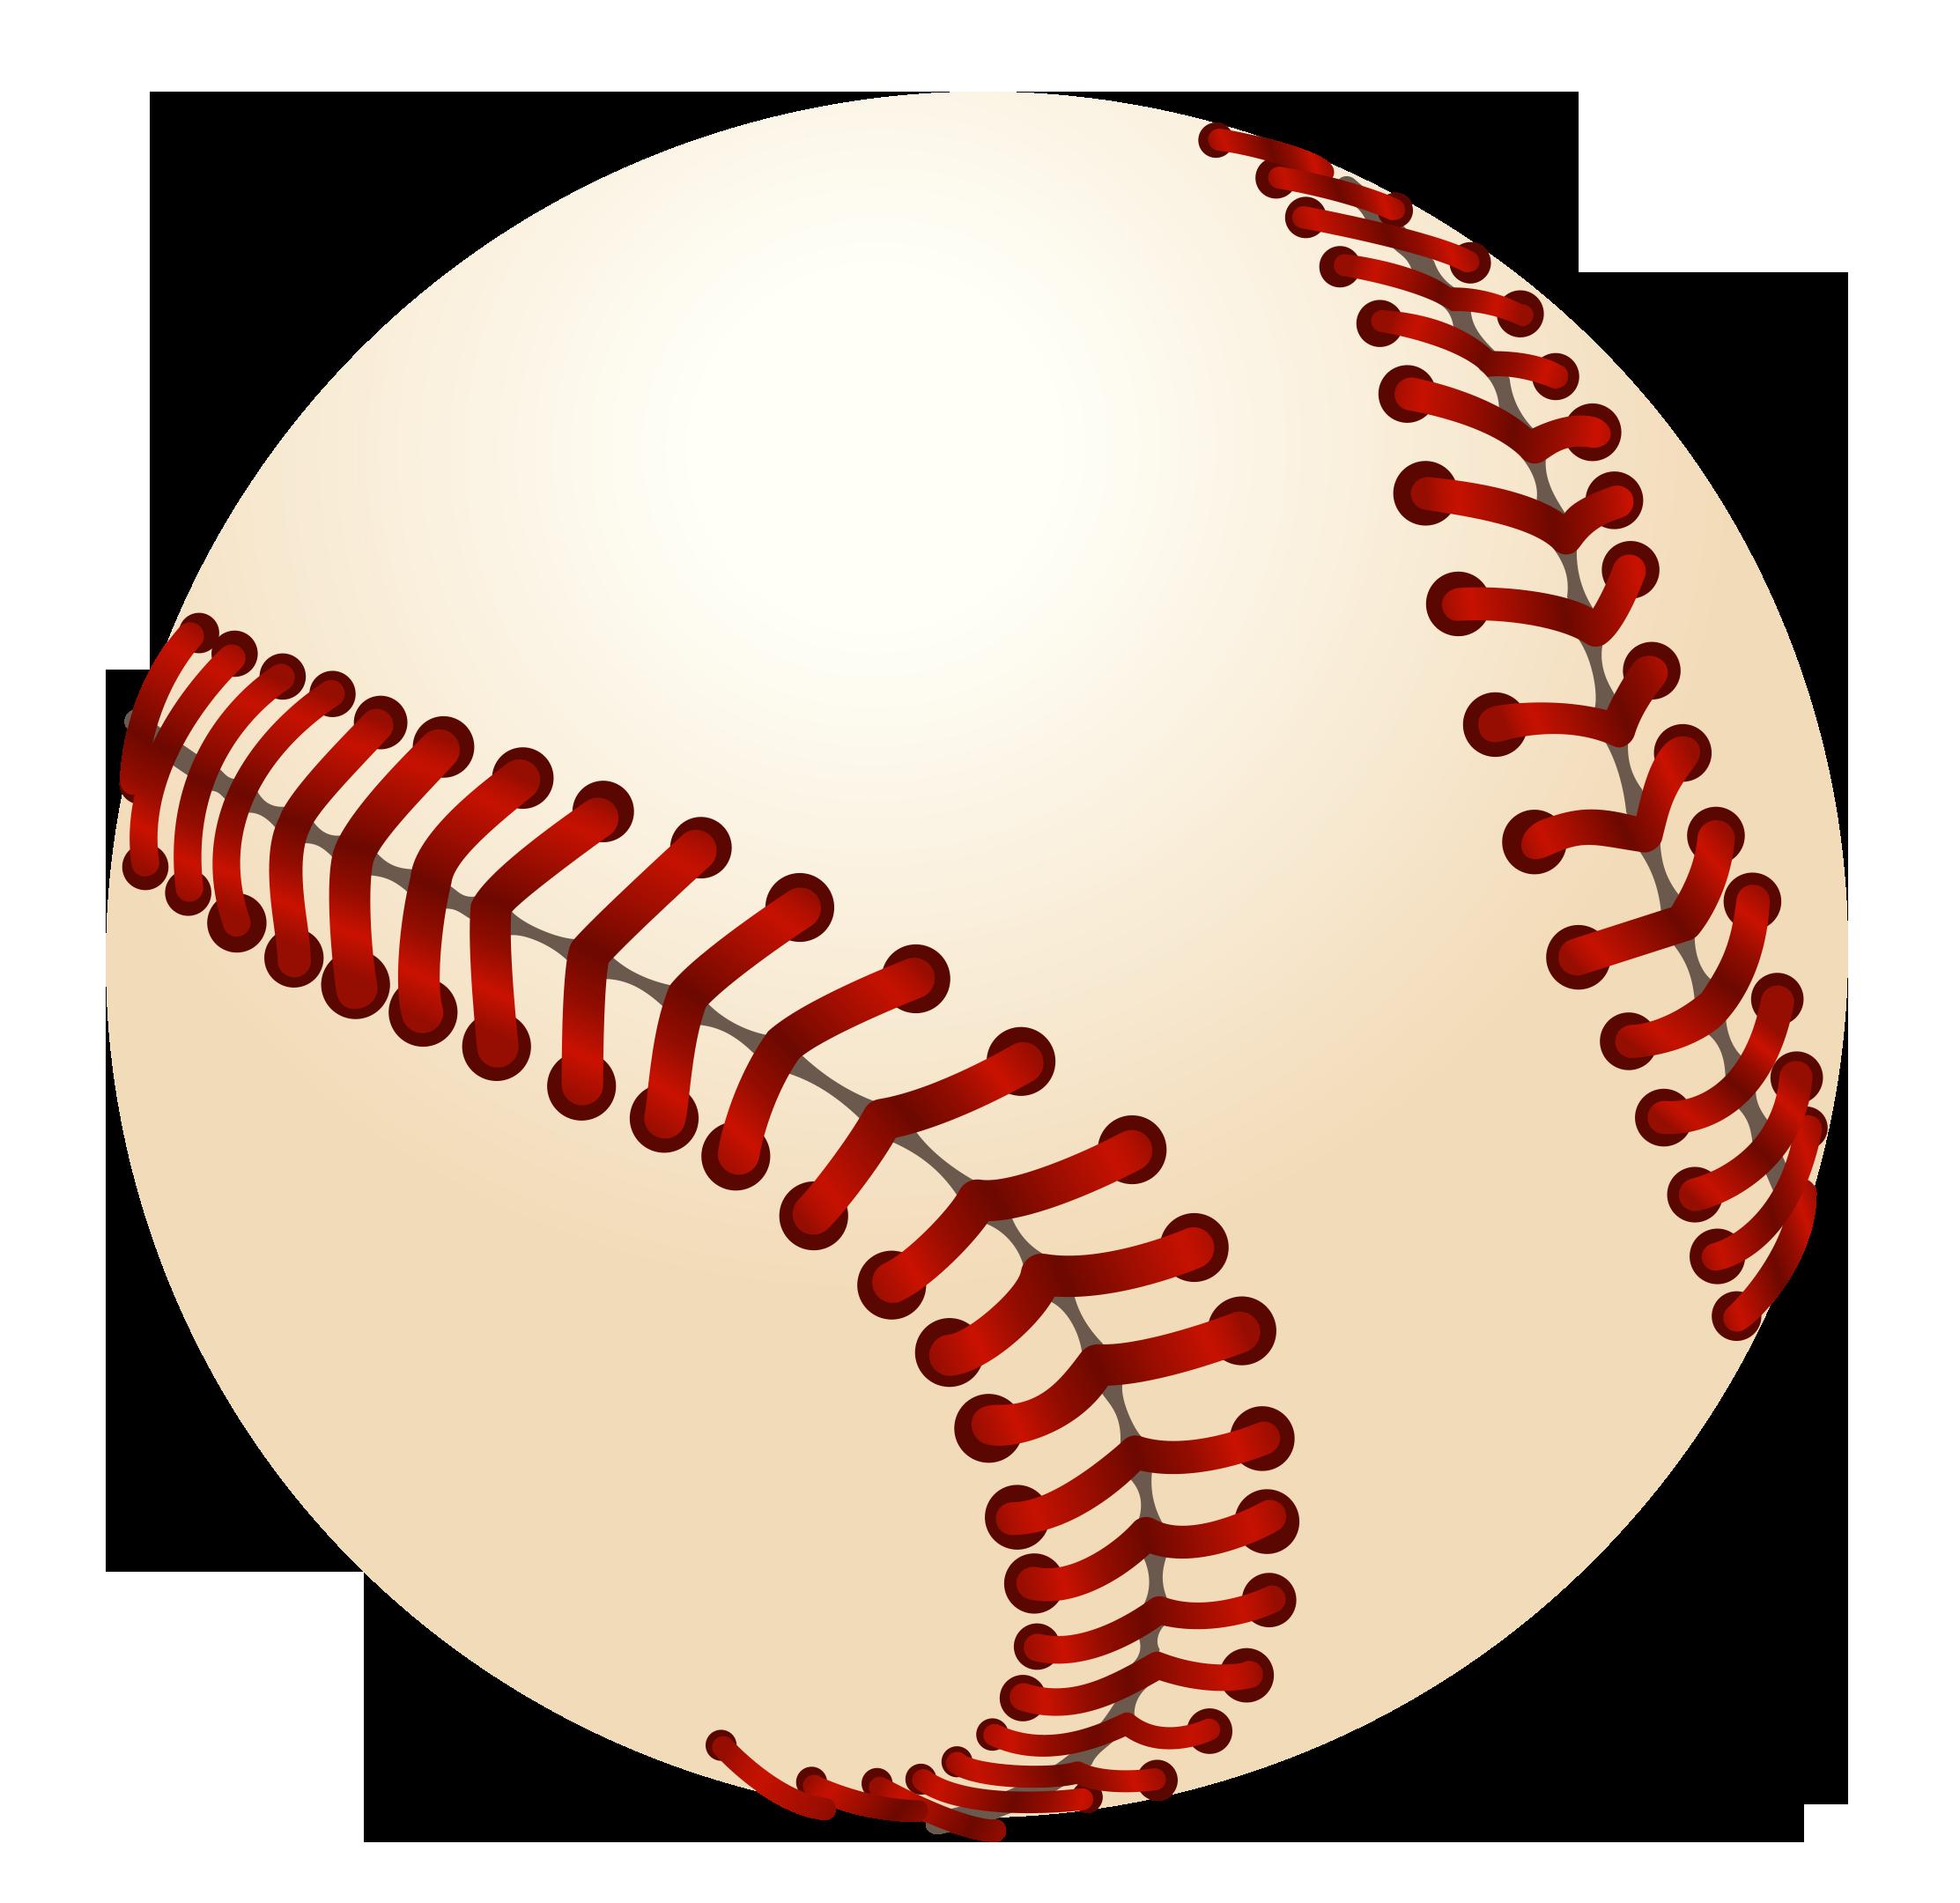 2225x2160 Baseball Ball Png Clipart Pictureu200b Gallery Yopriceville